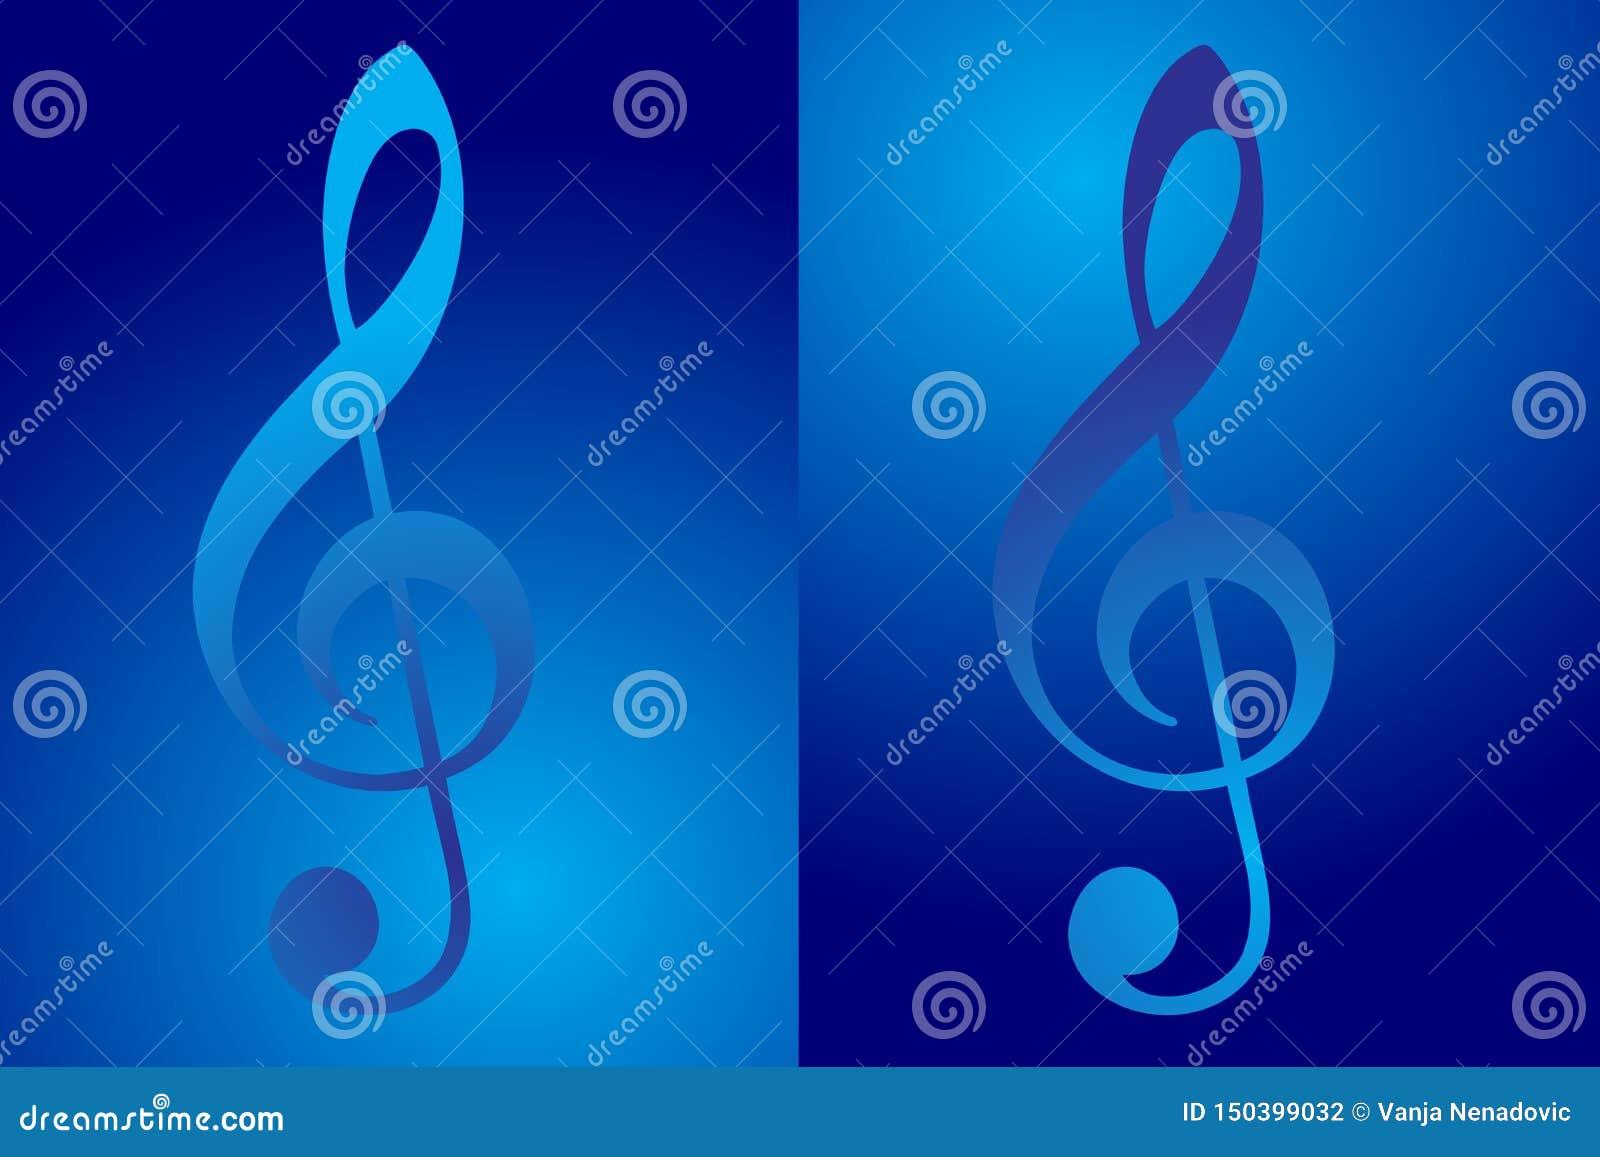 Ícone da clave de sol, nota da música na cor azul